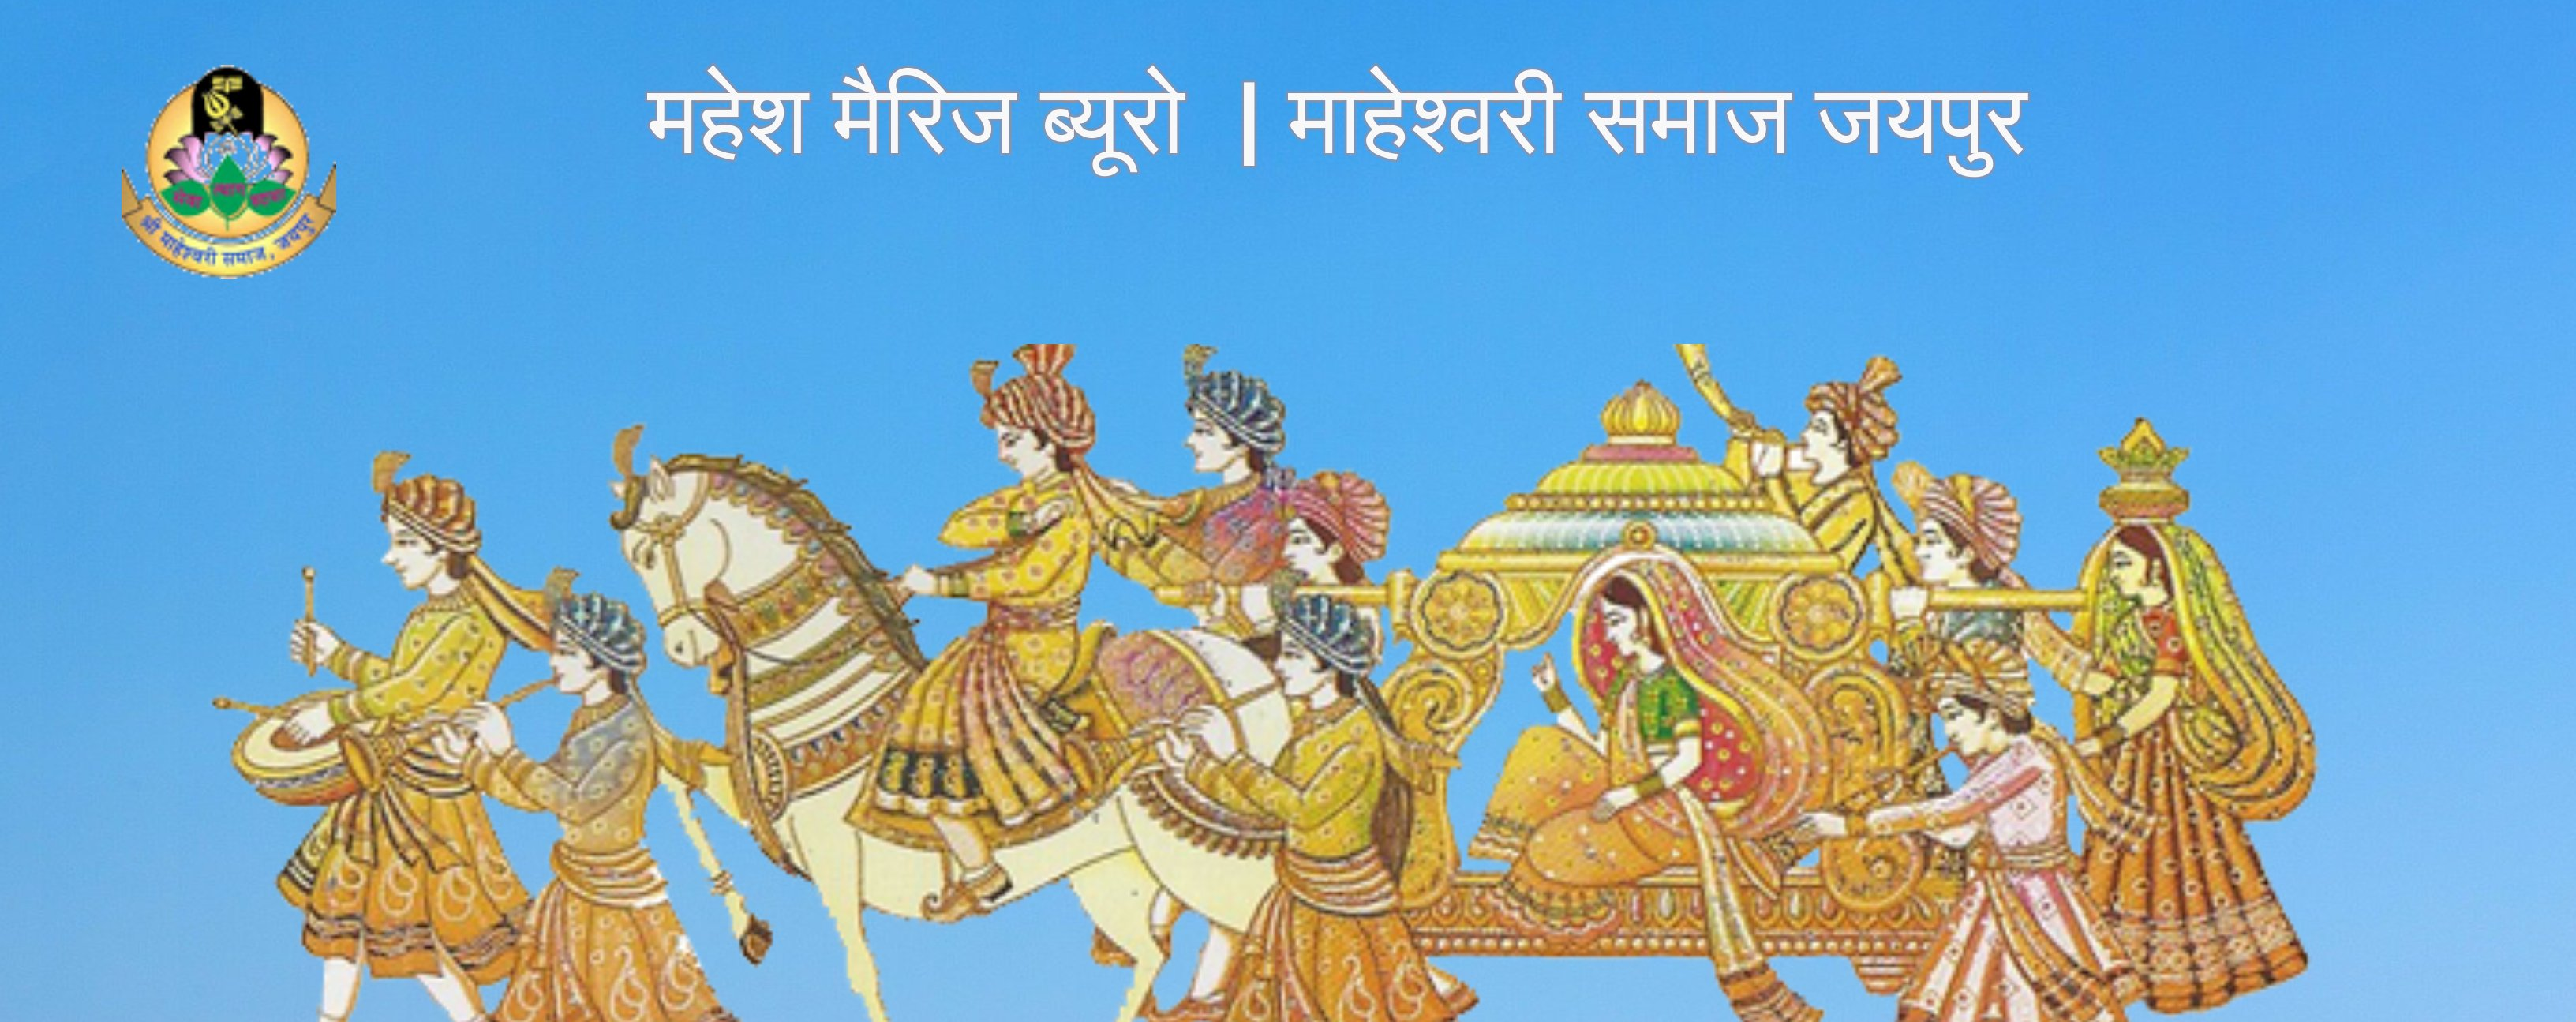 Mahesh Marriage Bureau | parichay